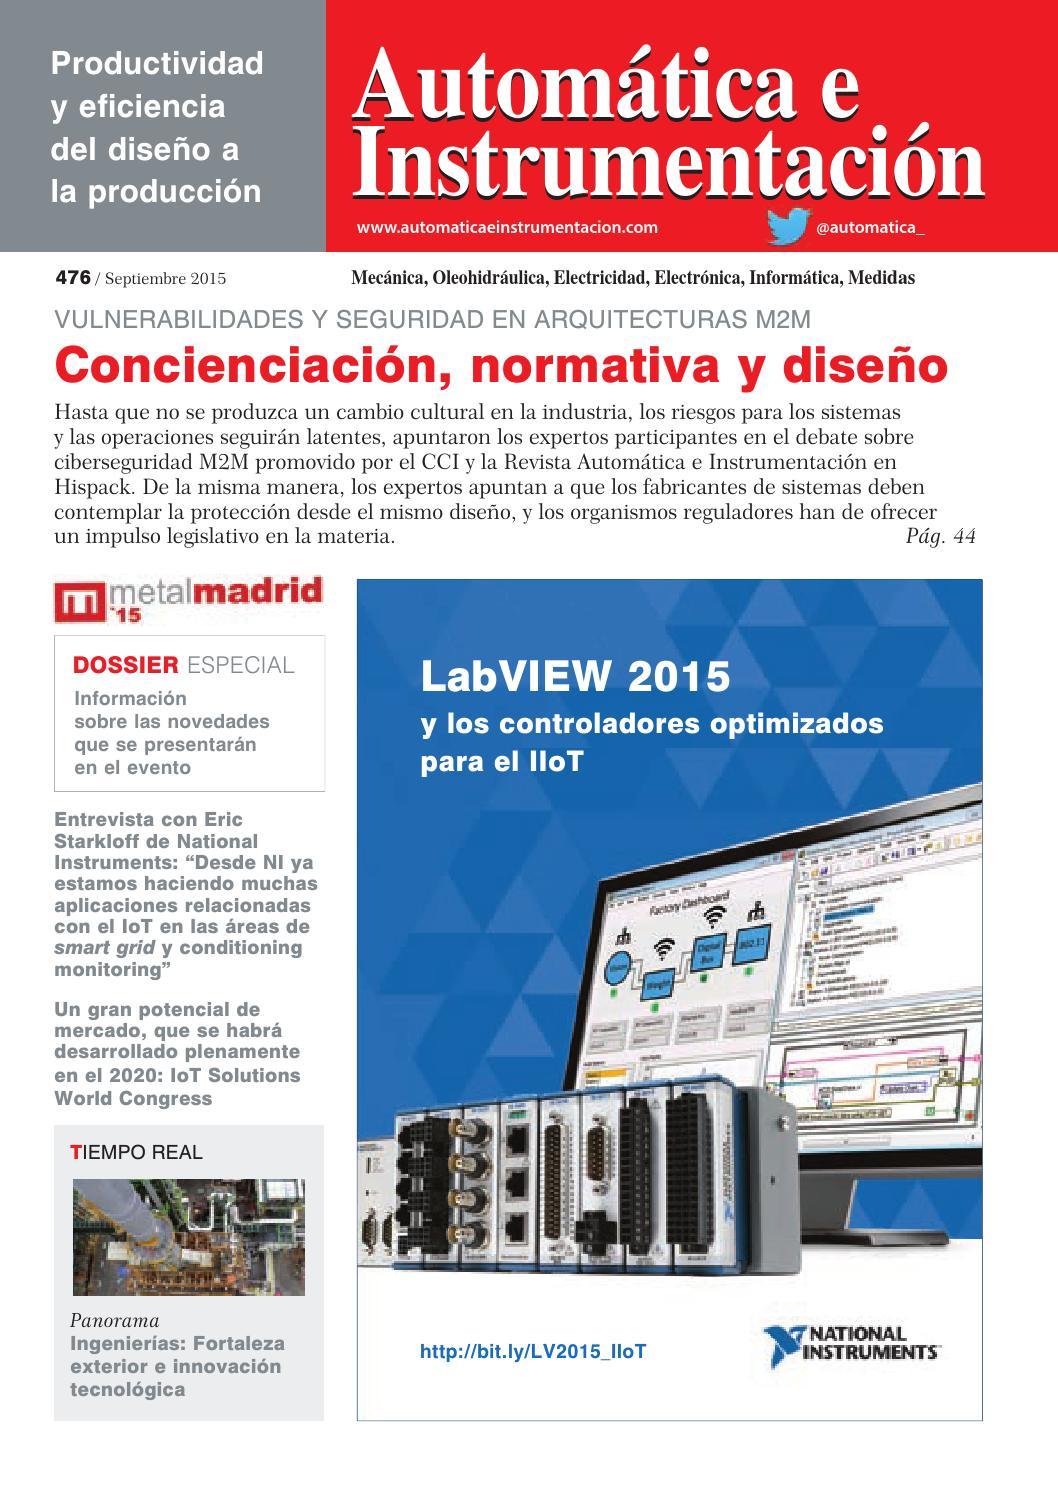 Automática e Instrumentación nº 476 by Digital Newspapers S.L. - issuu